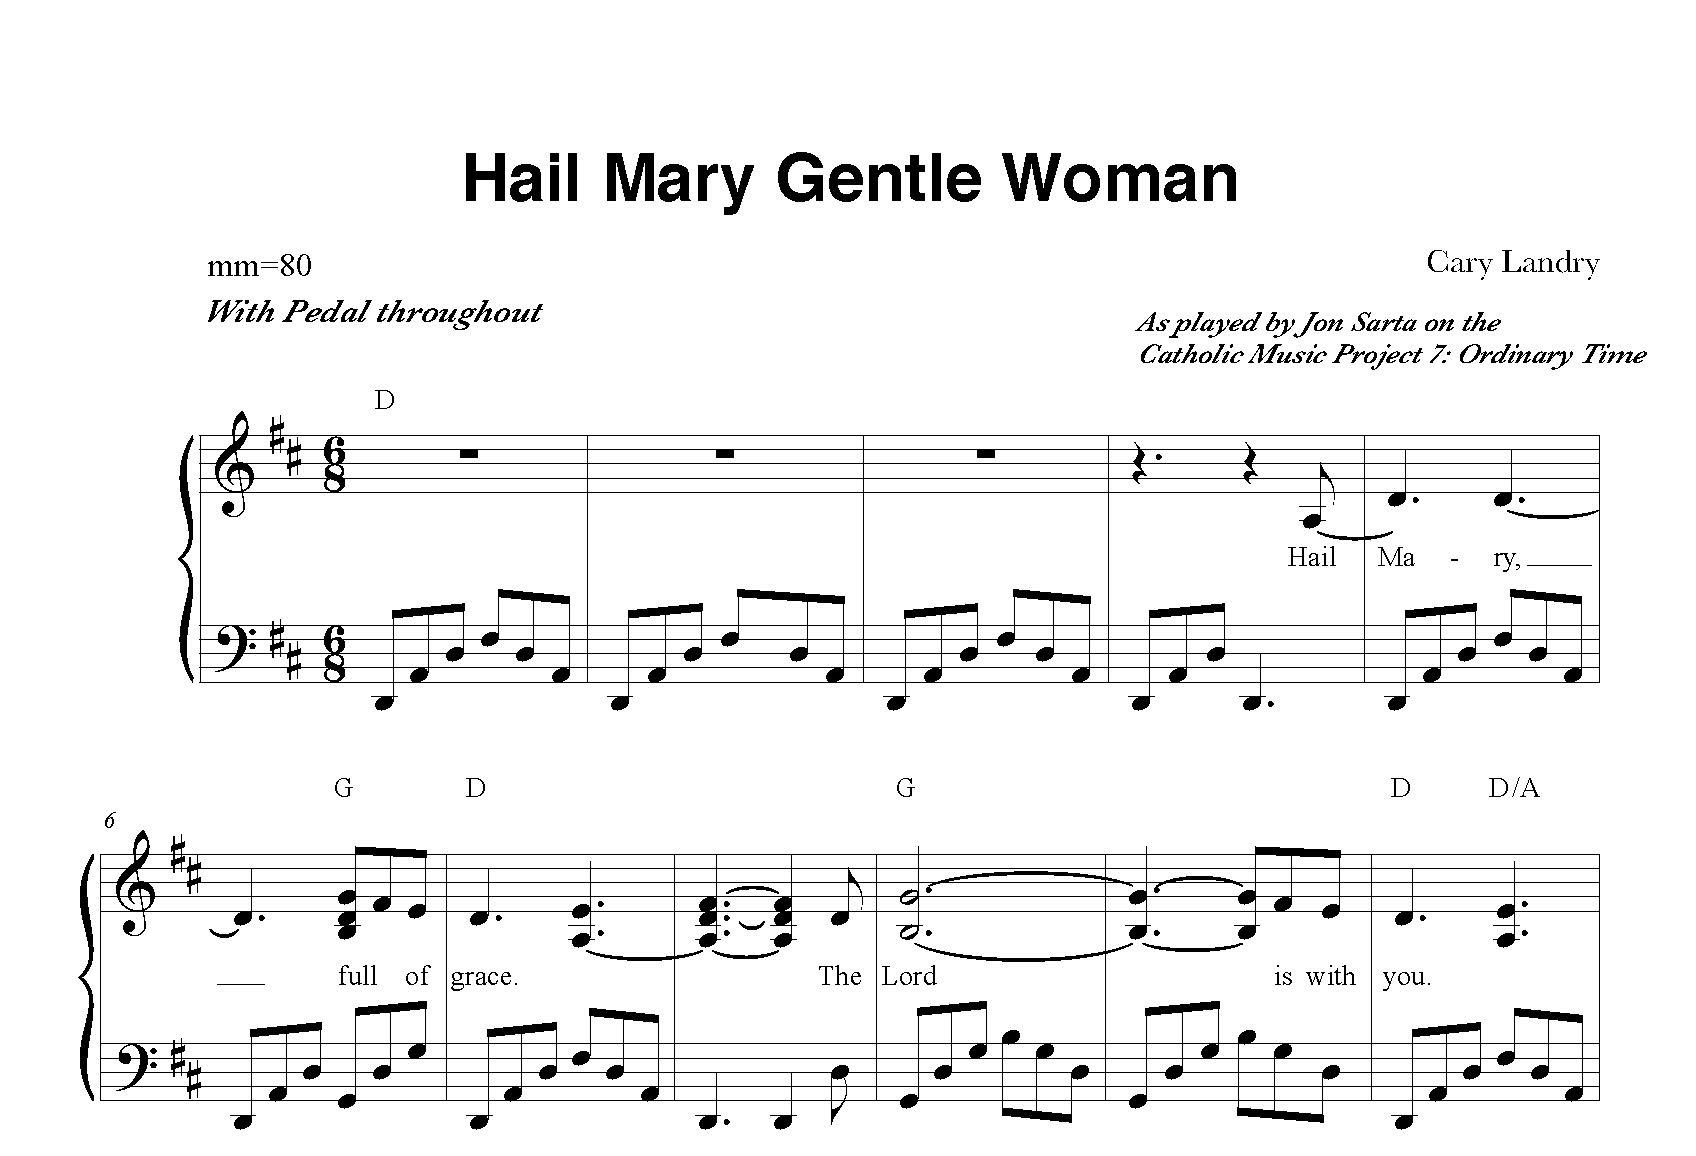 Hail Mary Gentle Woman Sheet Music